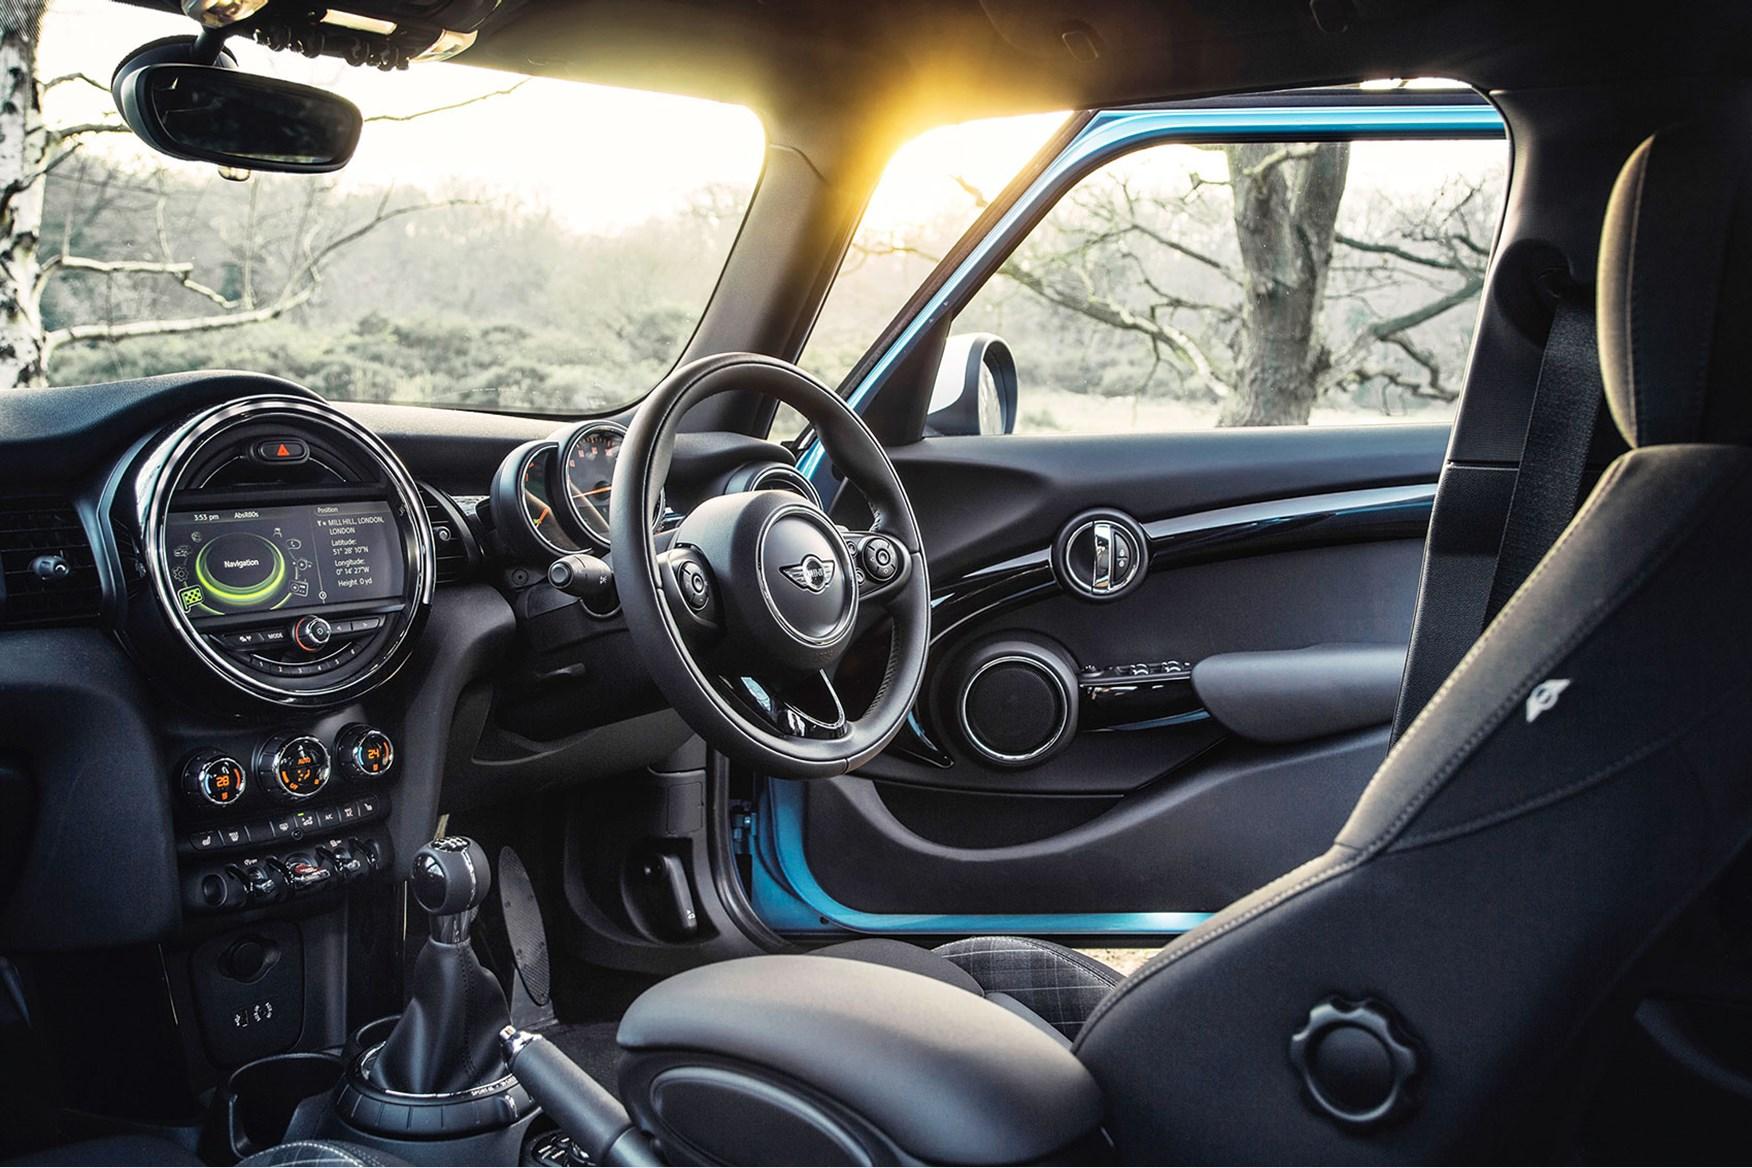 2015 mini cooper interior. mini 5dr big dials mood lighting and definitely more room in the front than back u0027 2015 cooper interior r